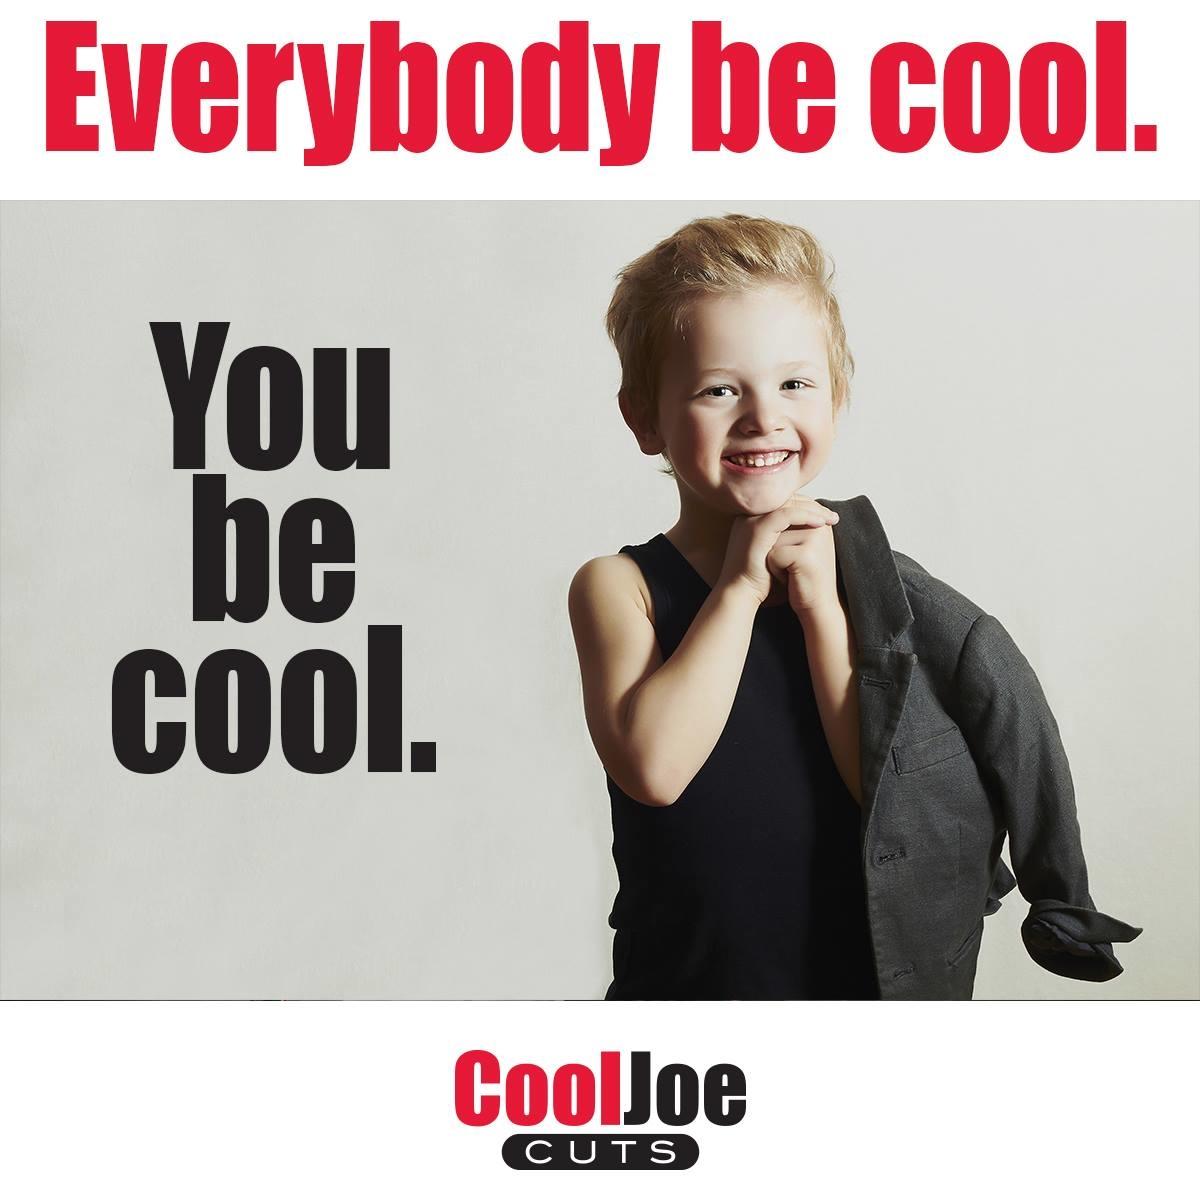 Cool Joe Cuts - Sean Haggerty image 1